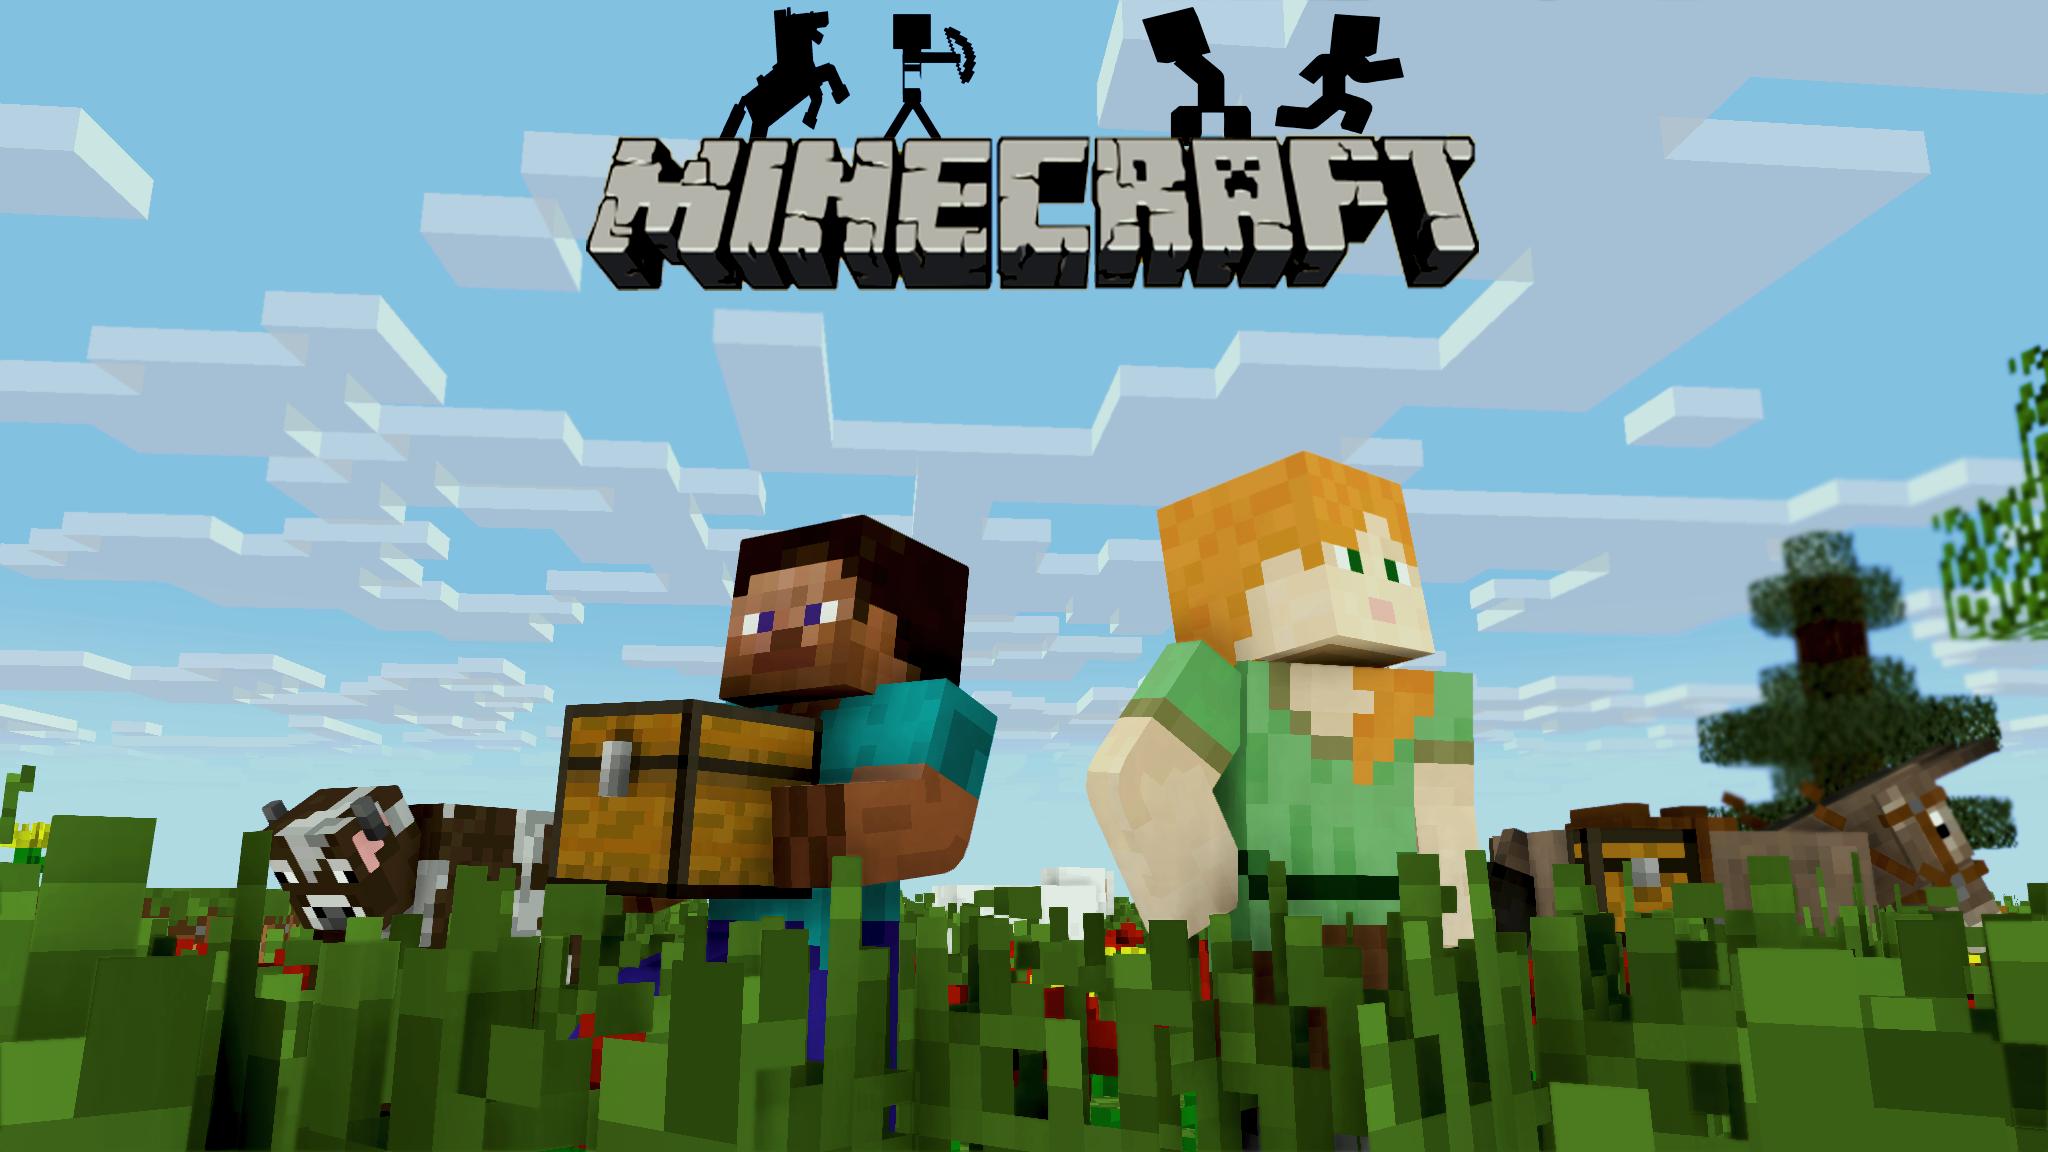 2048 By 1152 Of Minecraft: Steve & Alex HD Wallpaper